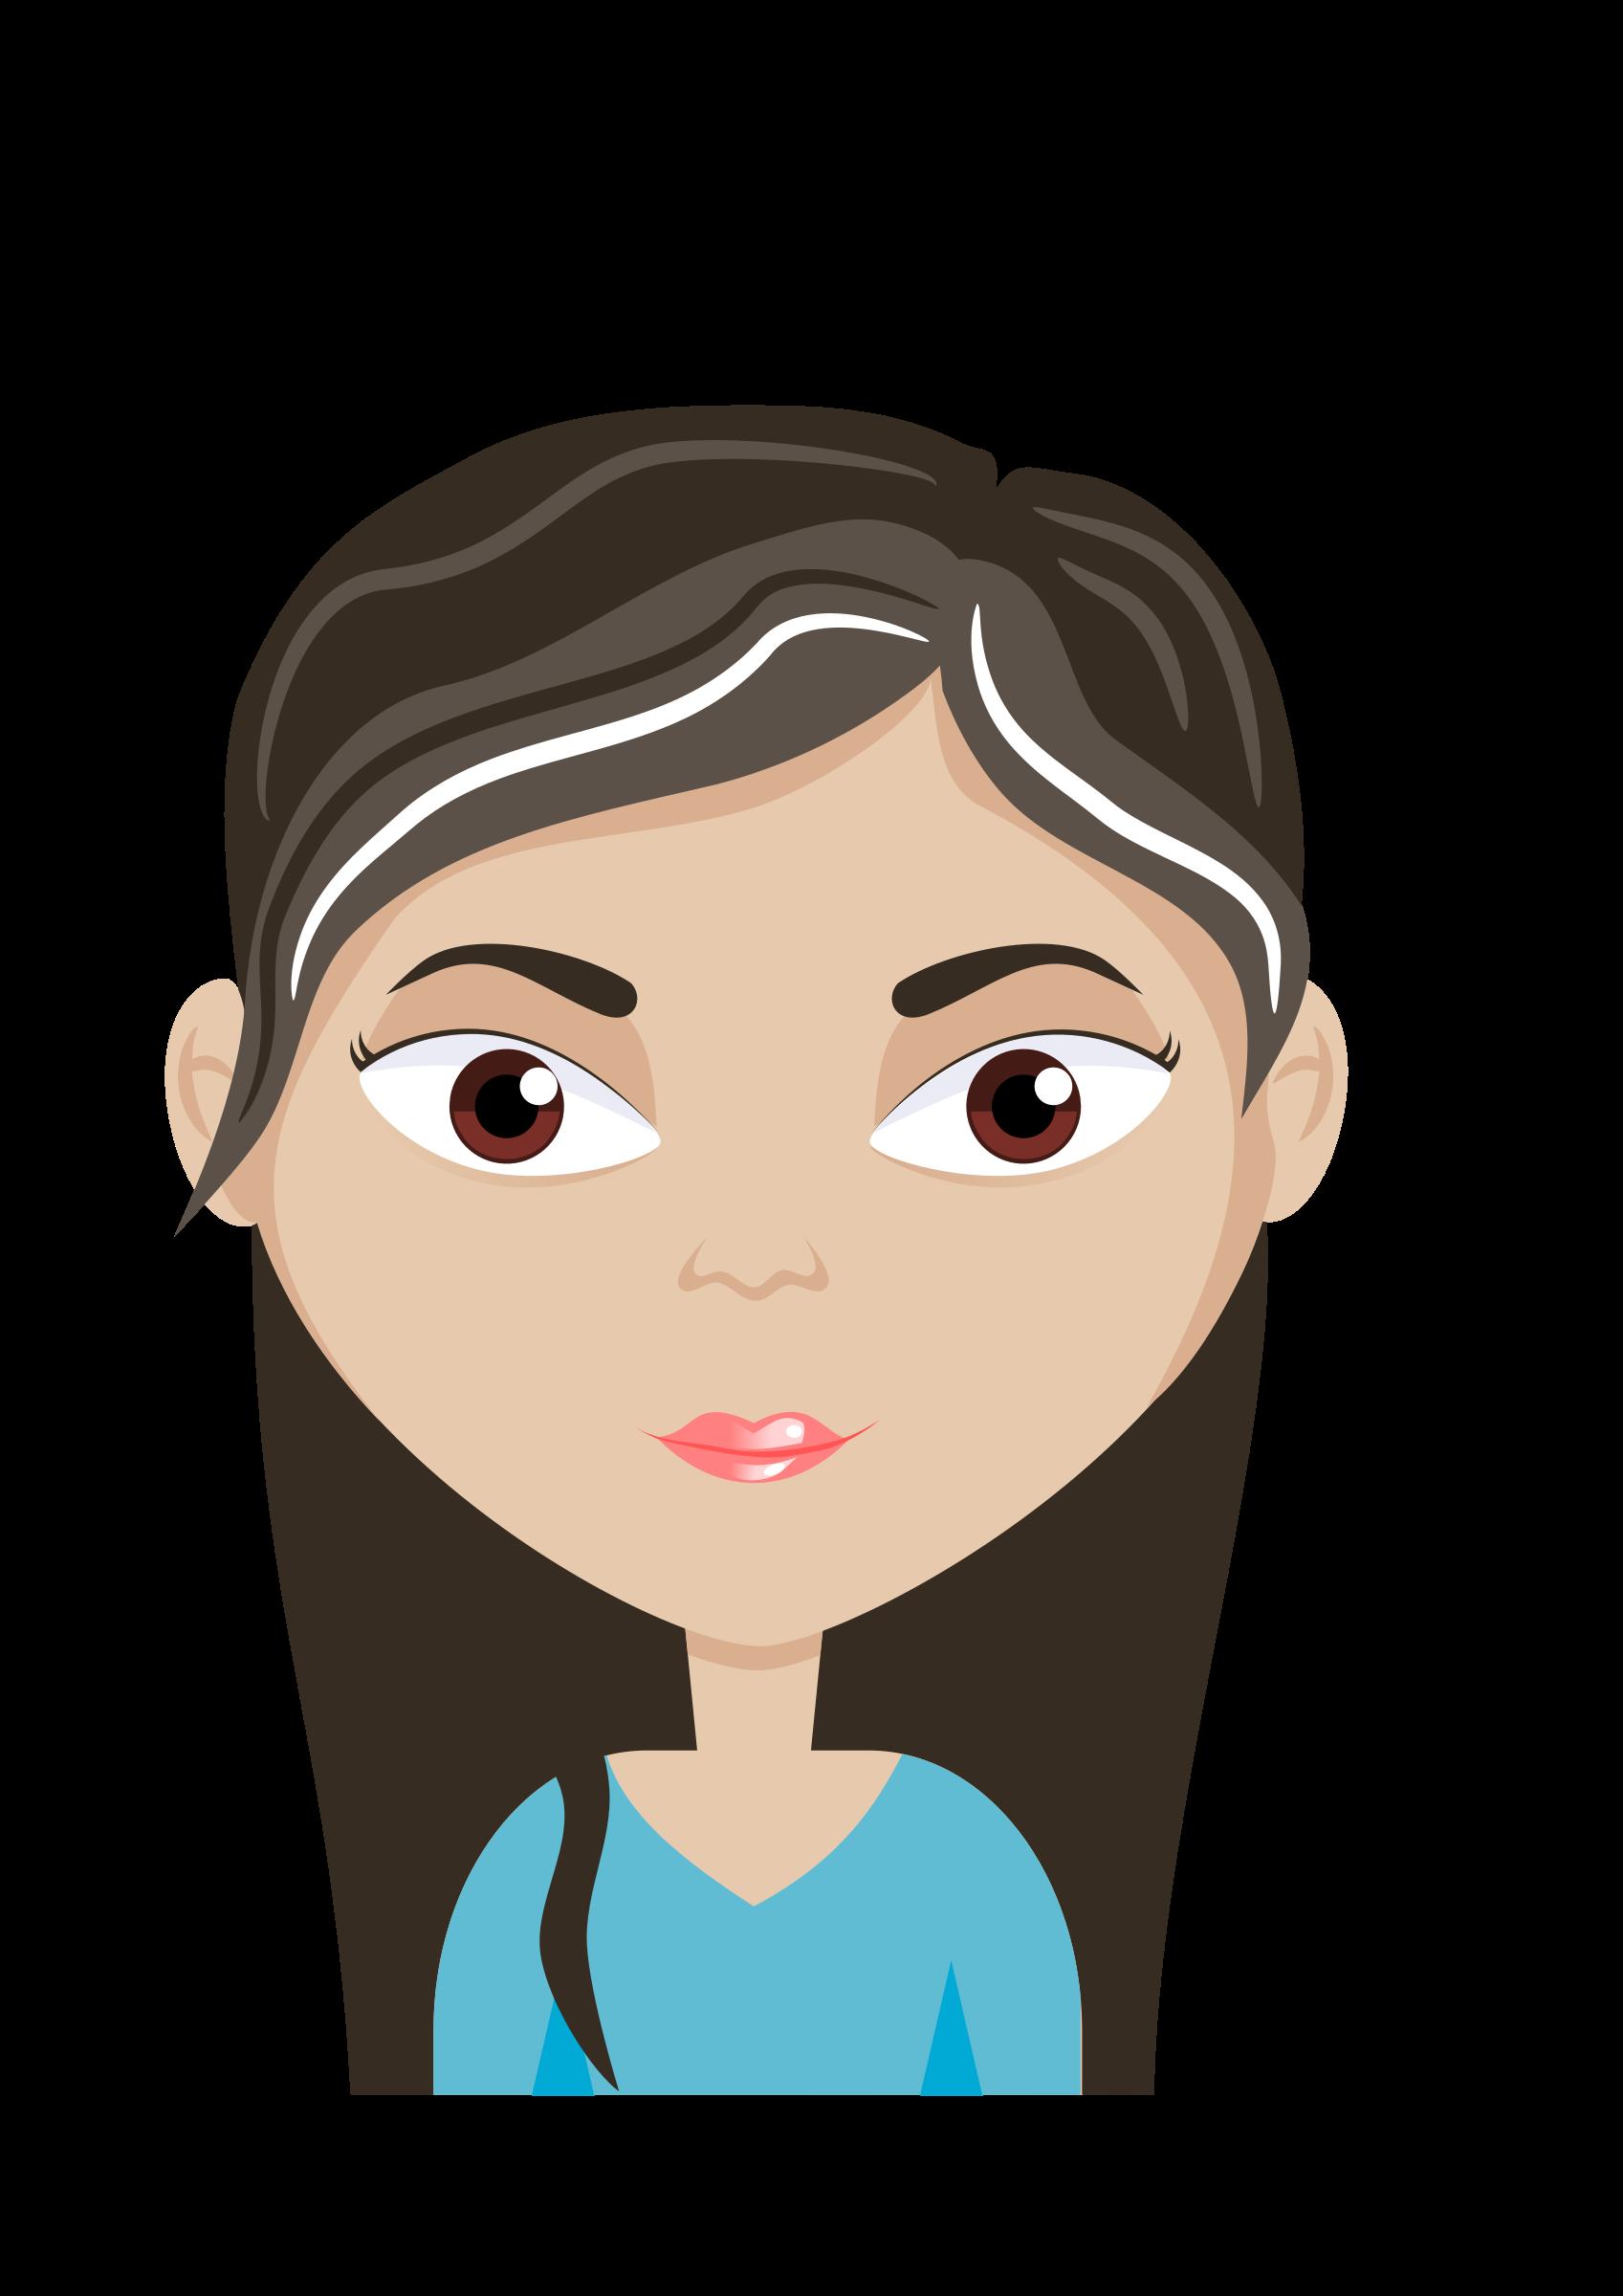 Clipart - Female cartoon avatar